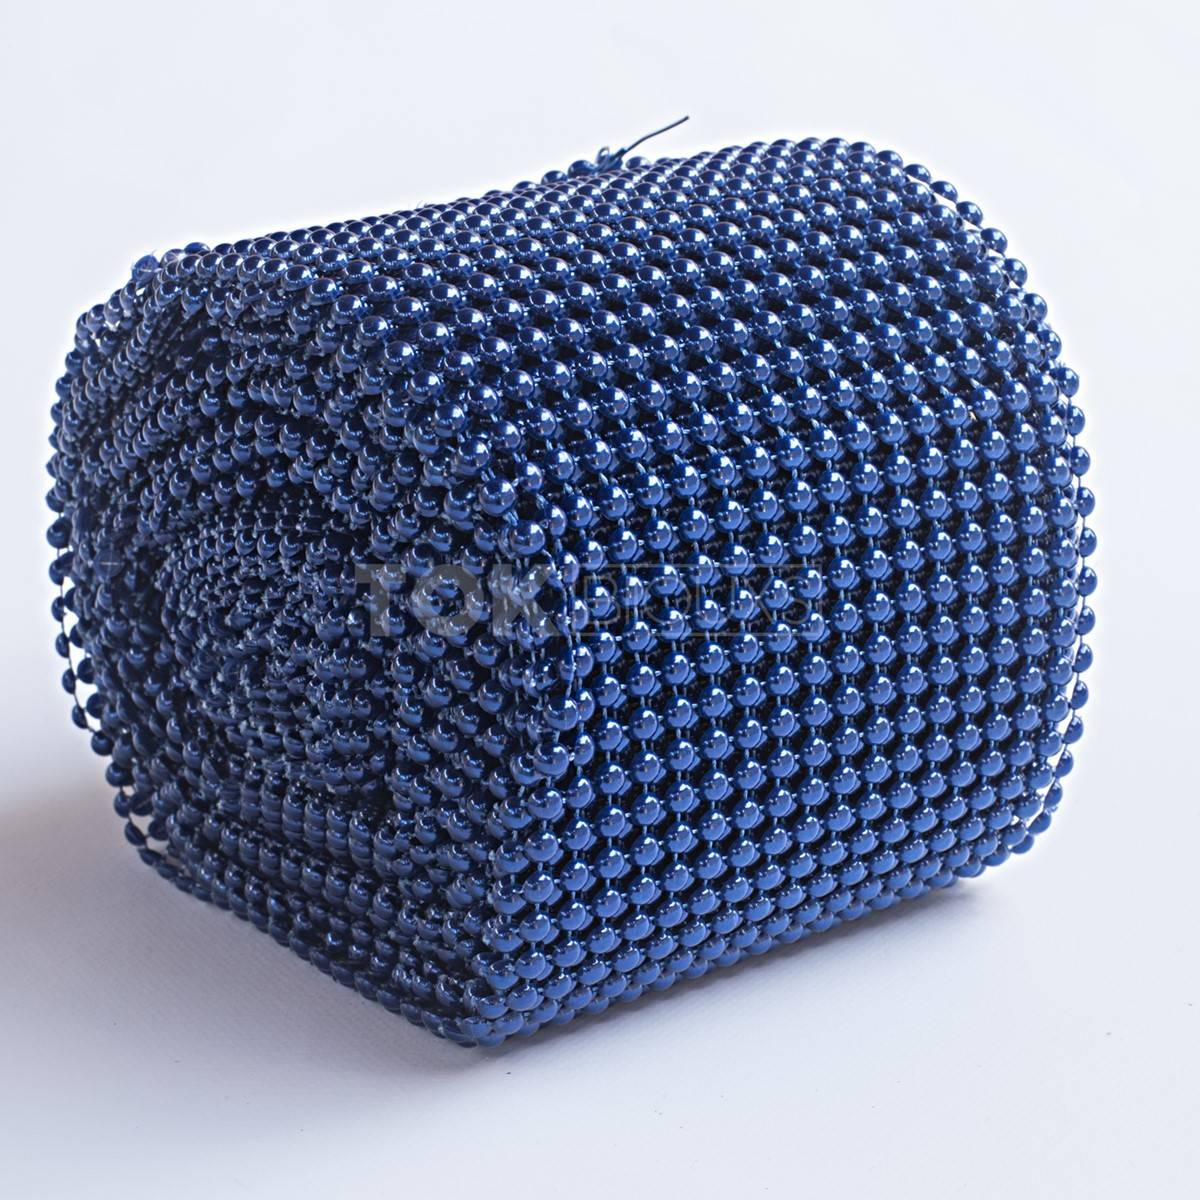 Manta Meia Pérola Abs - 8mm - Azul Royal - 9,14 Metros